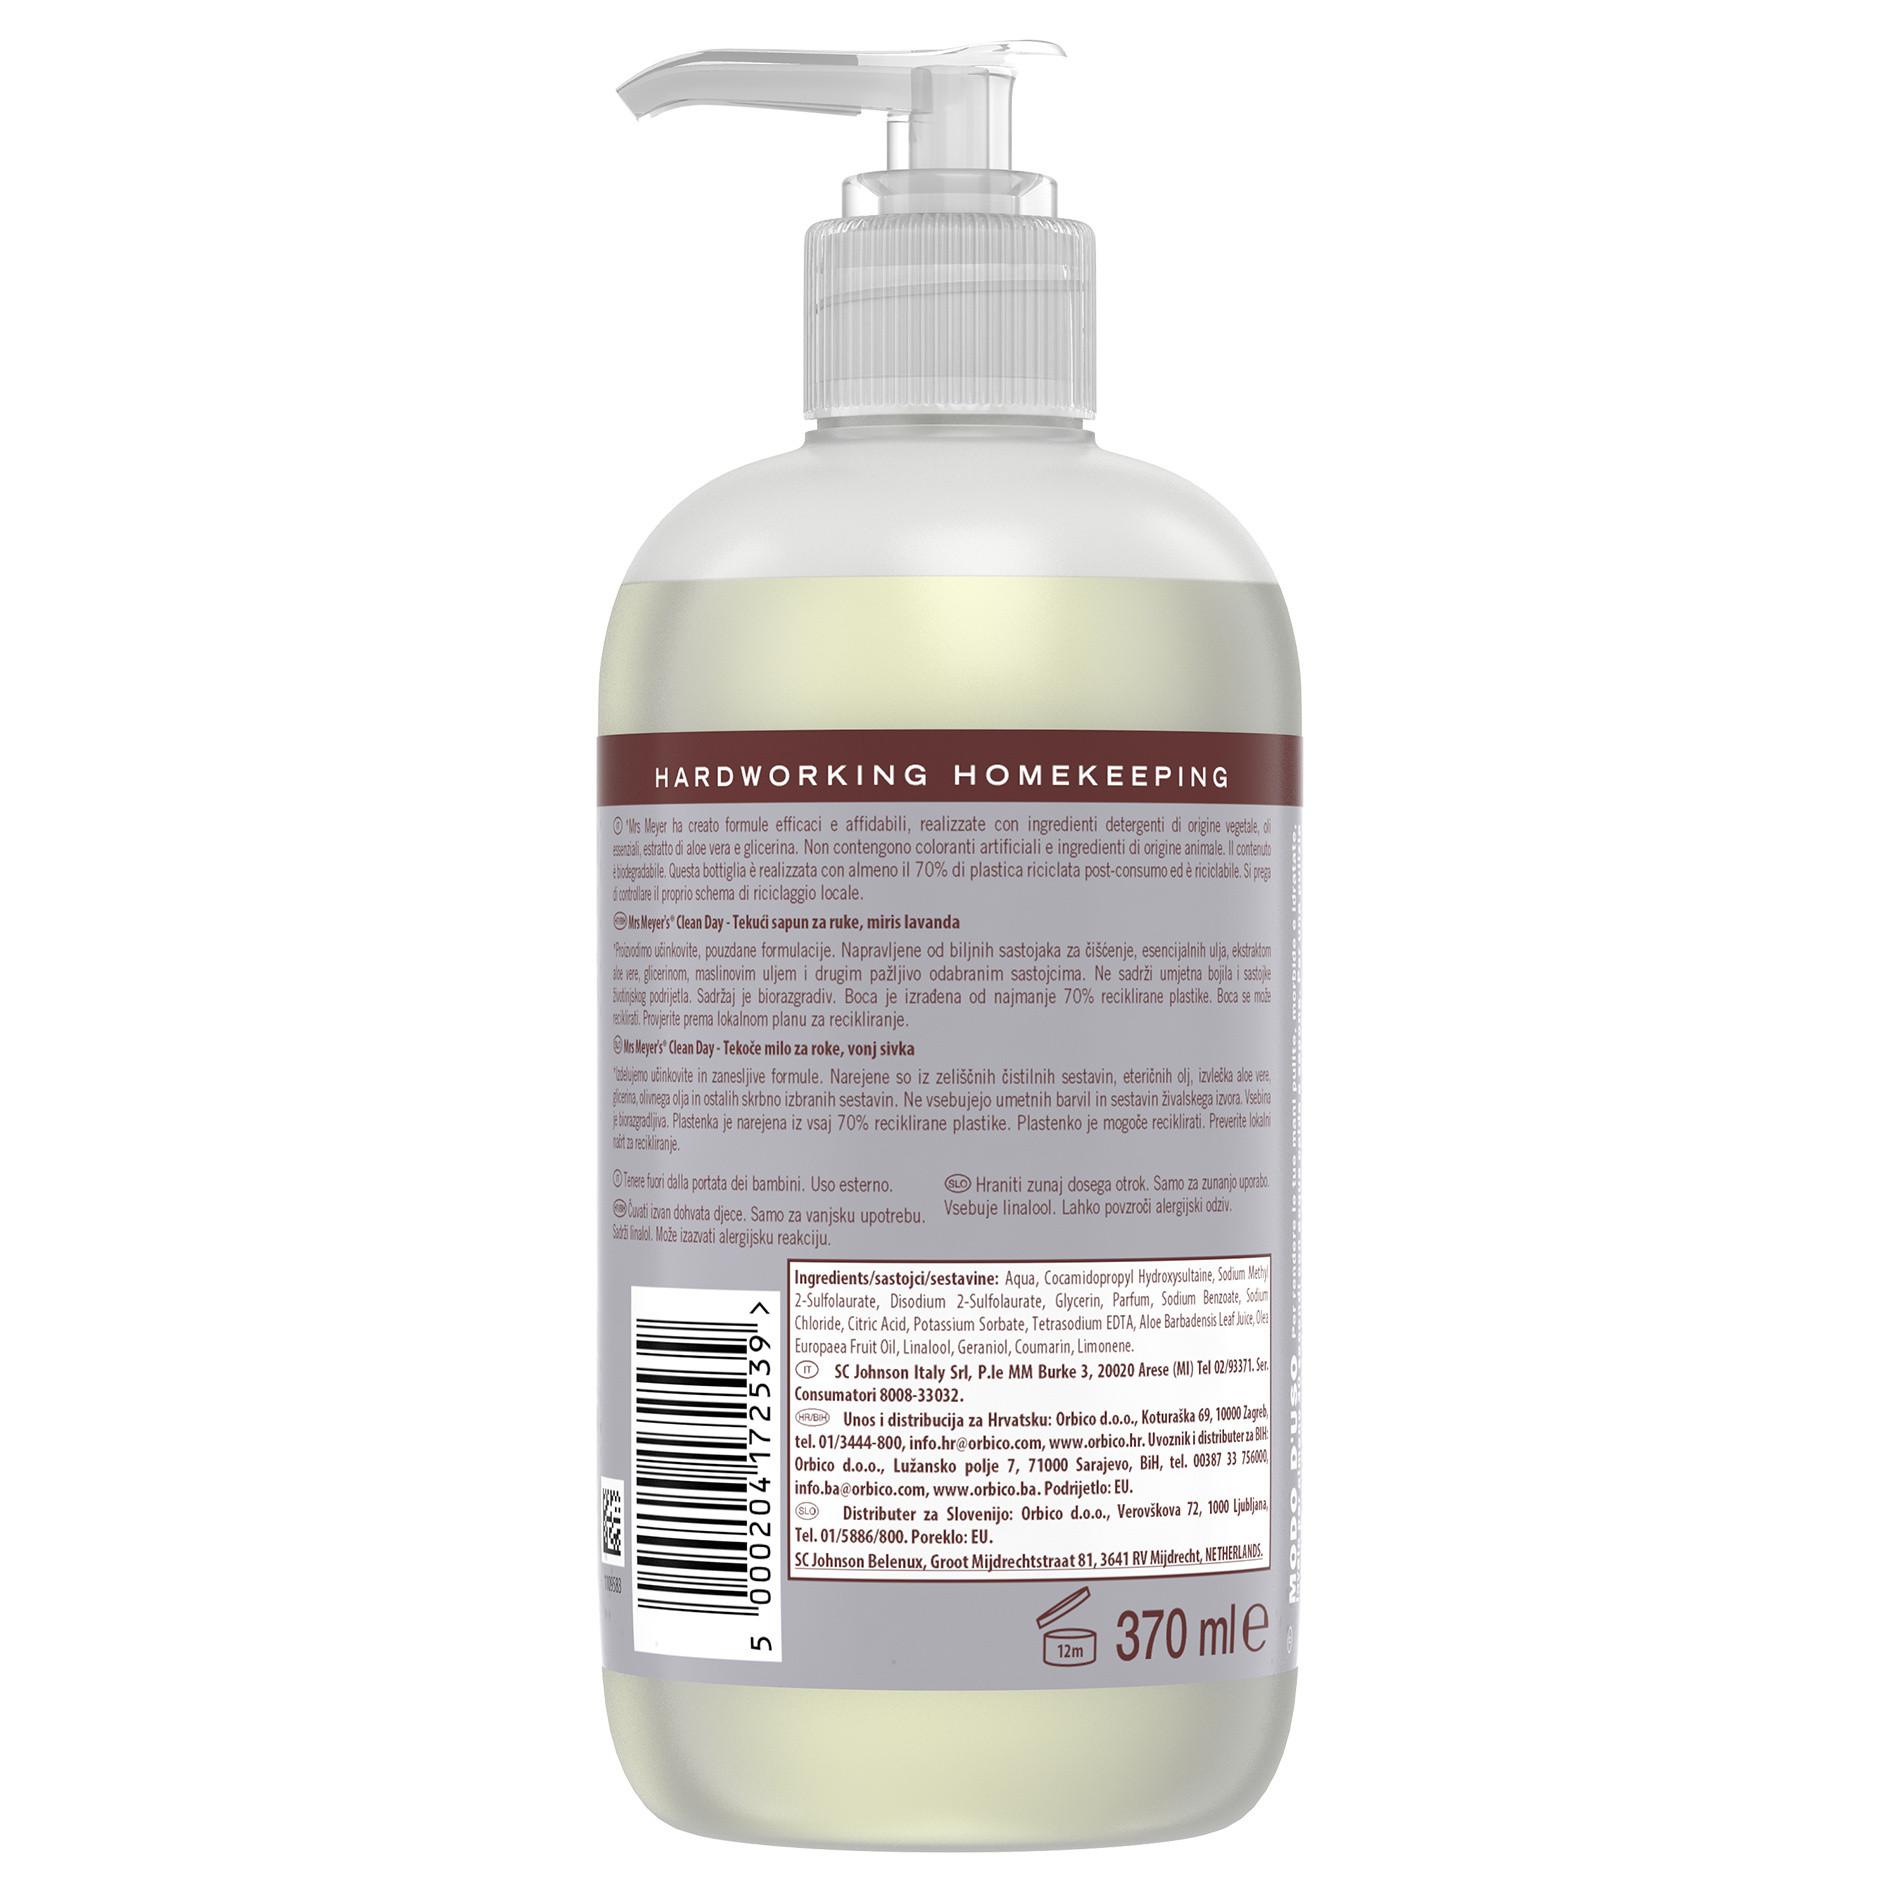 Sapone liquido per mani profumo di lavanda 370ml, Grigio, large image number 1